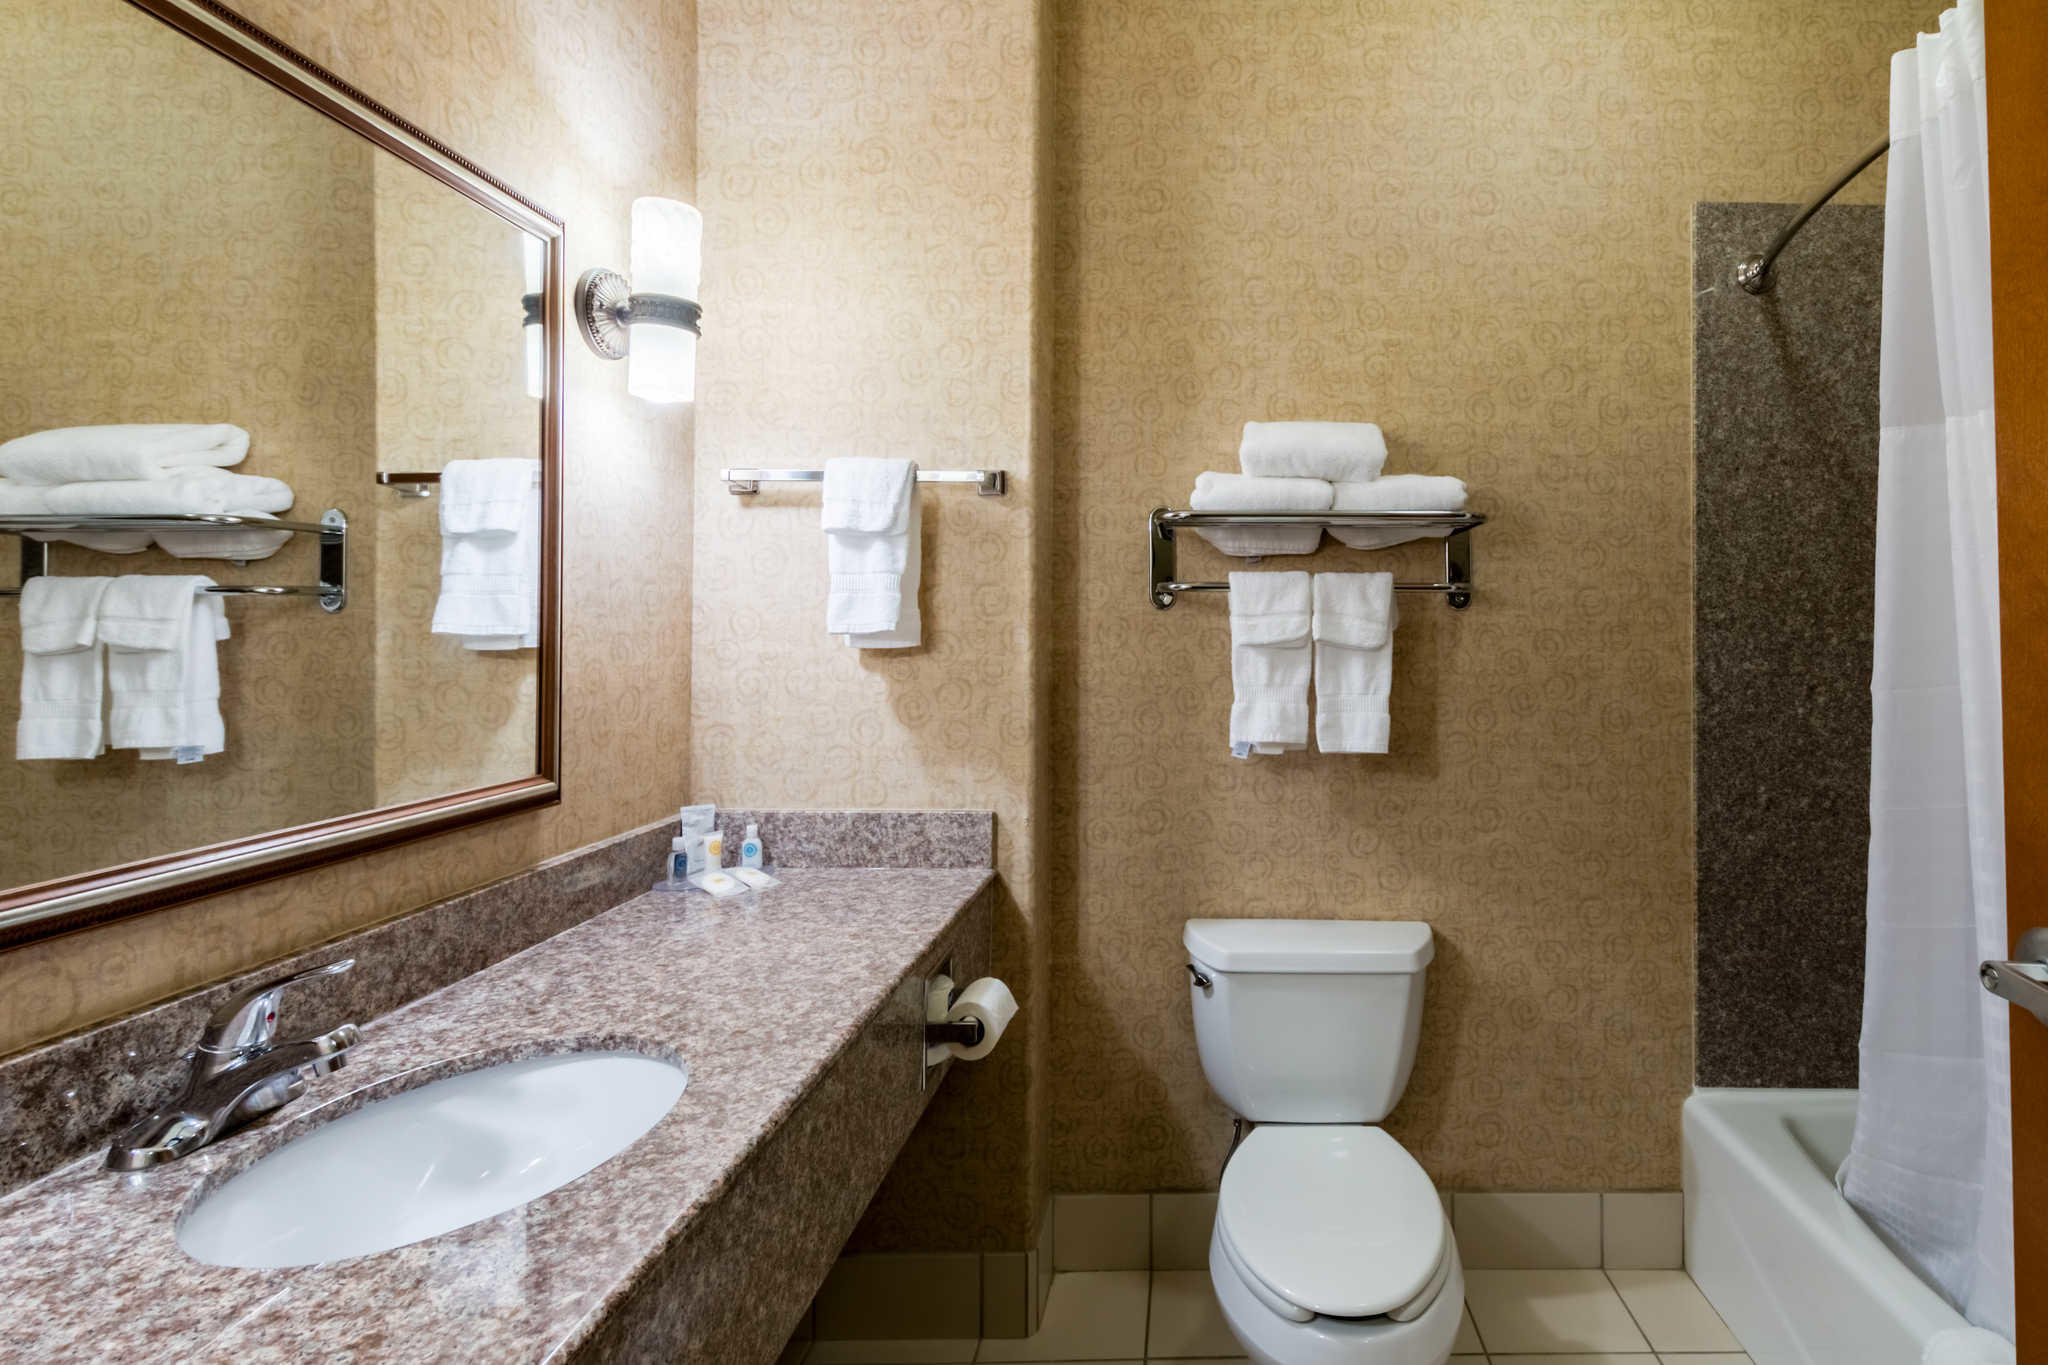 Comfort Inn & Suites near Comanche Peak image 15